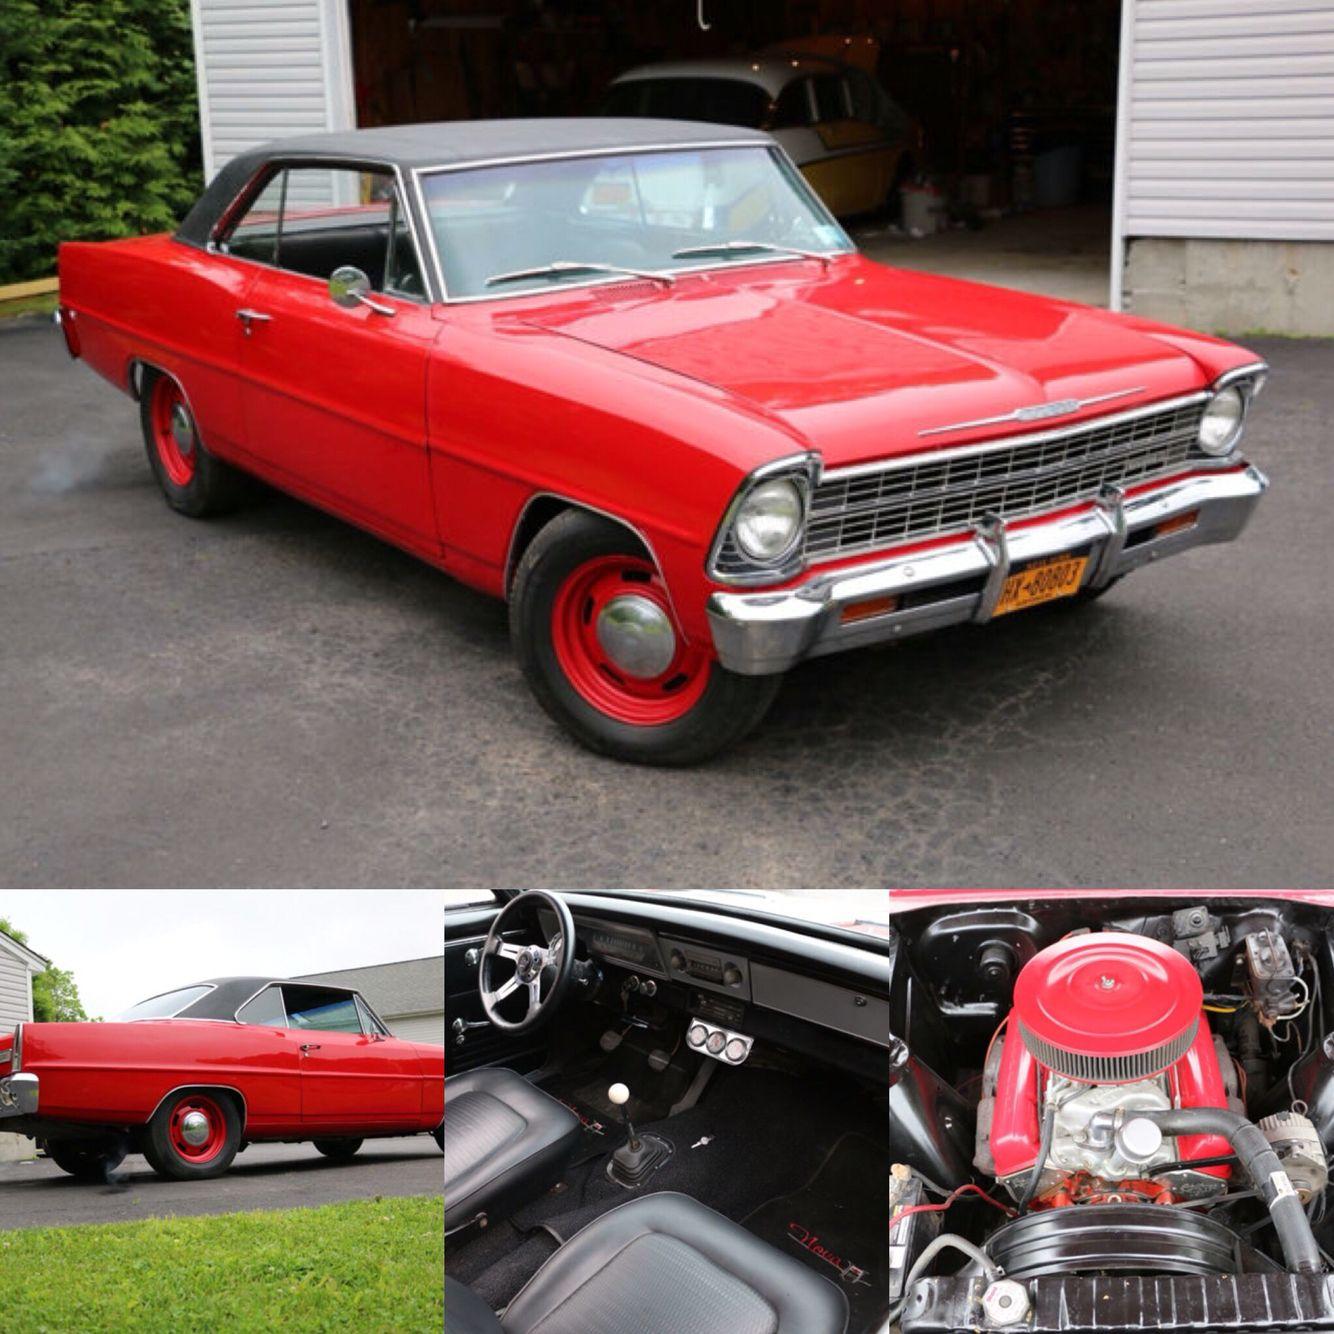 1967 Chevrolet Nova II Hard Top For Sale PRICE REDUCTION